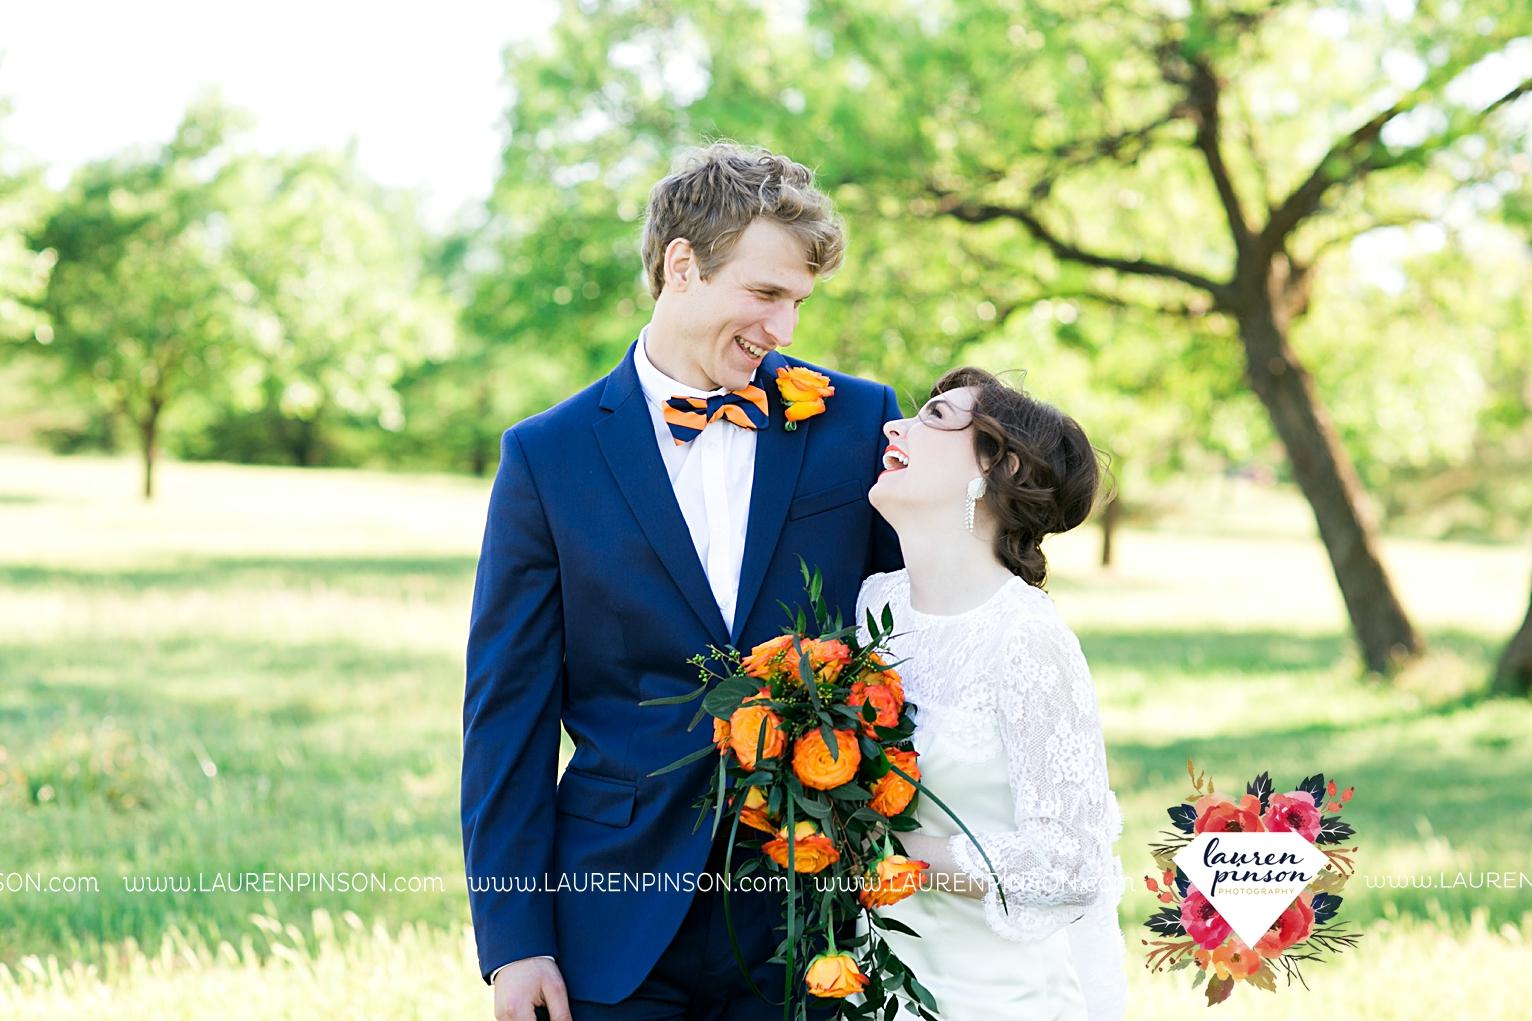 wichita-falls-texas-wedding-photographer-vintage-off-beat-bride-faith-village-church-of-christ-the-plex-roller-skating_2430.jpg